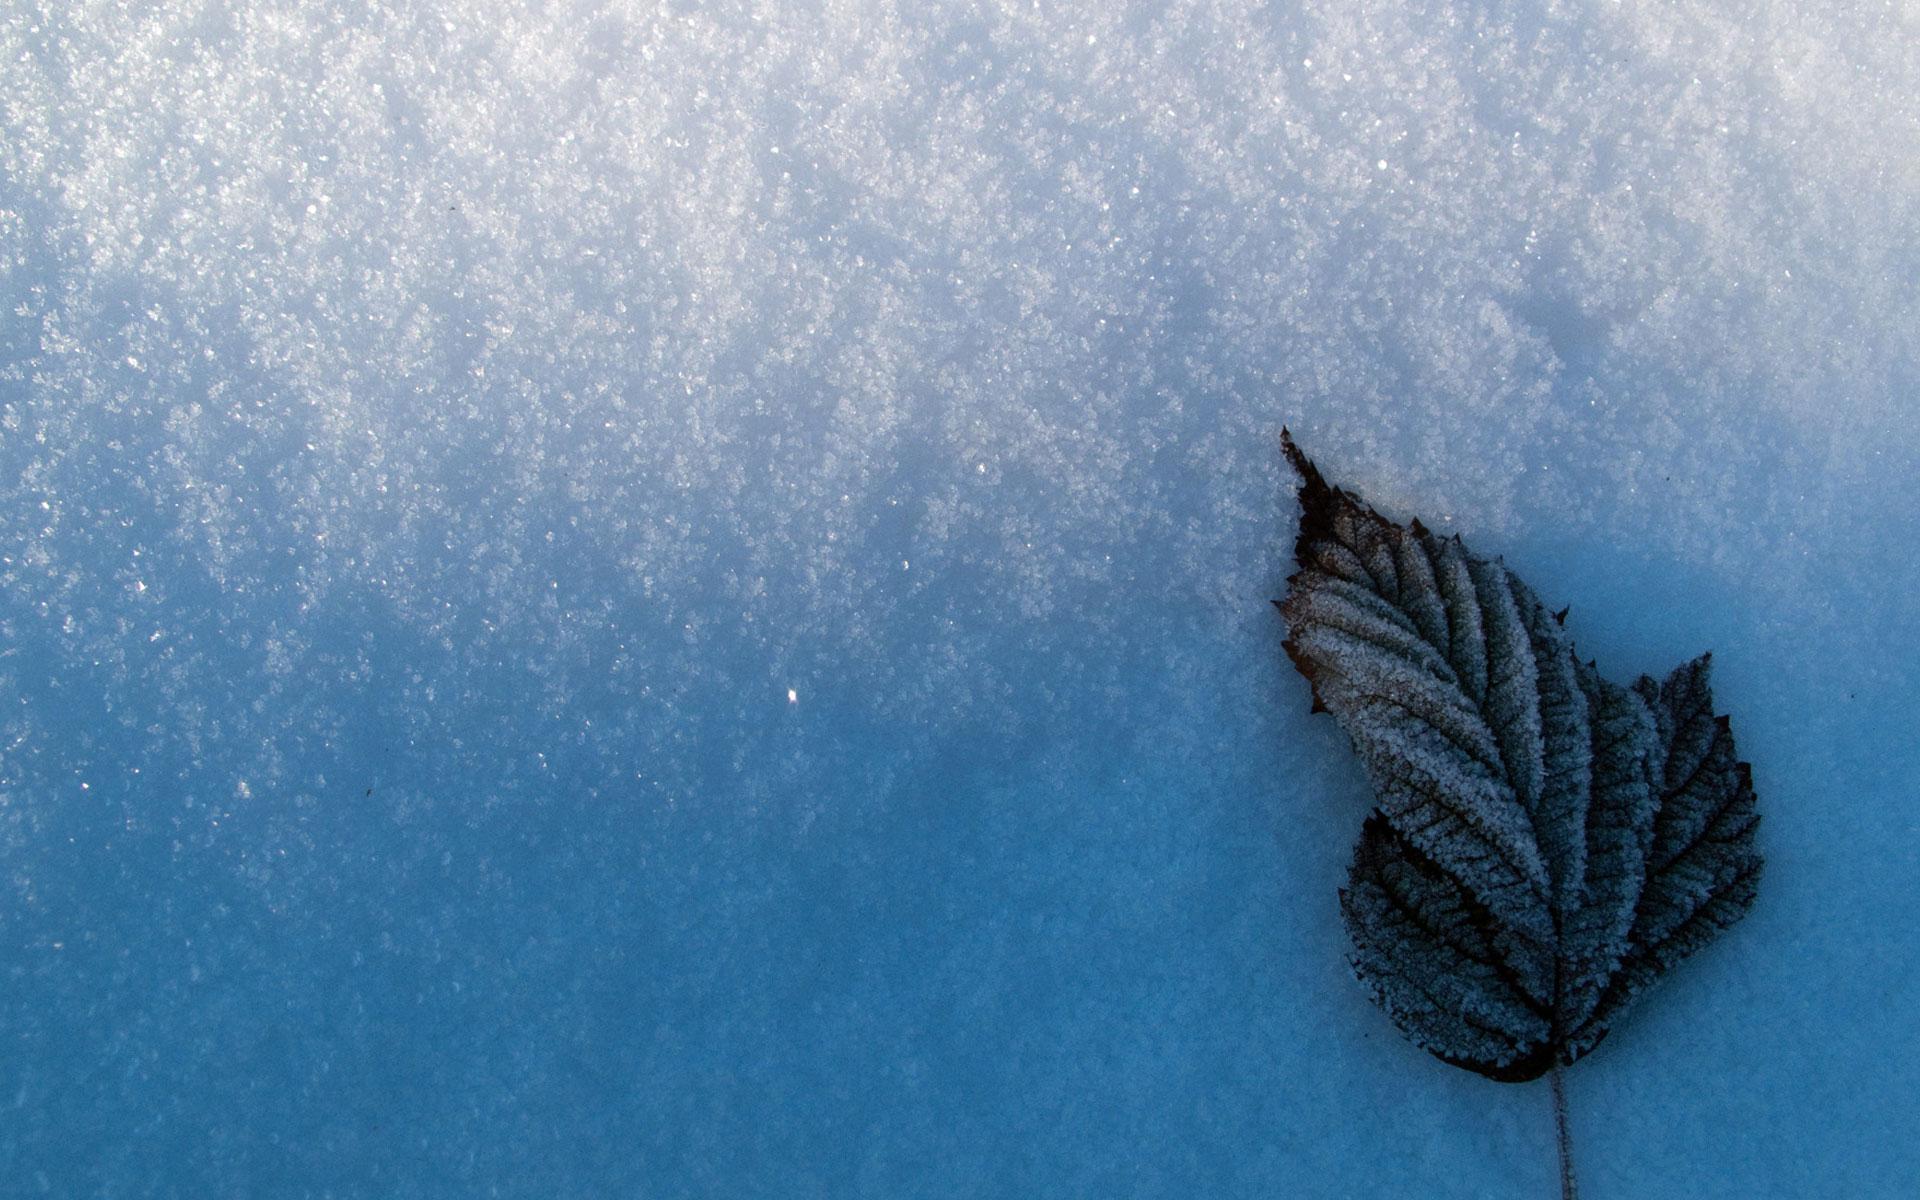 snow wallpaper leaf